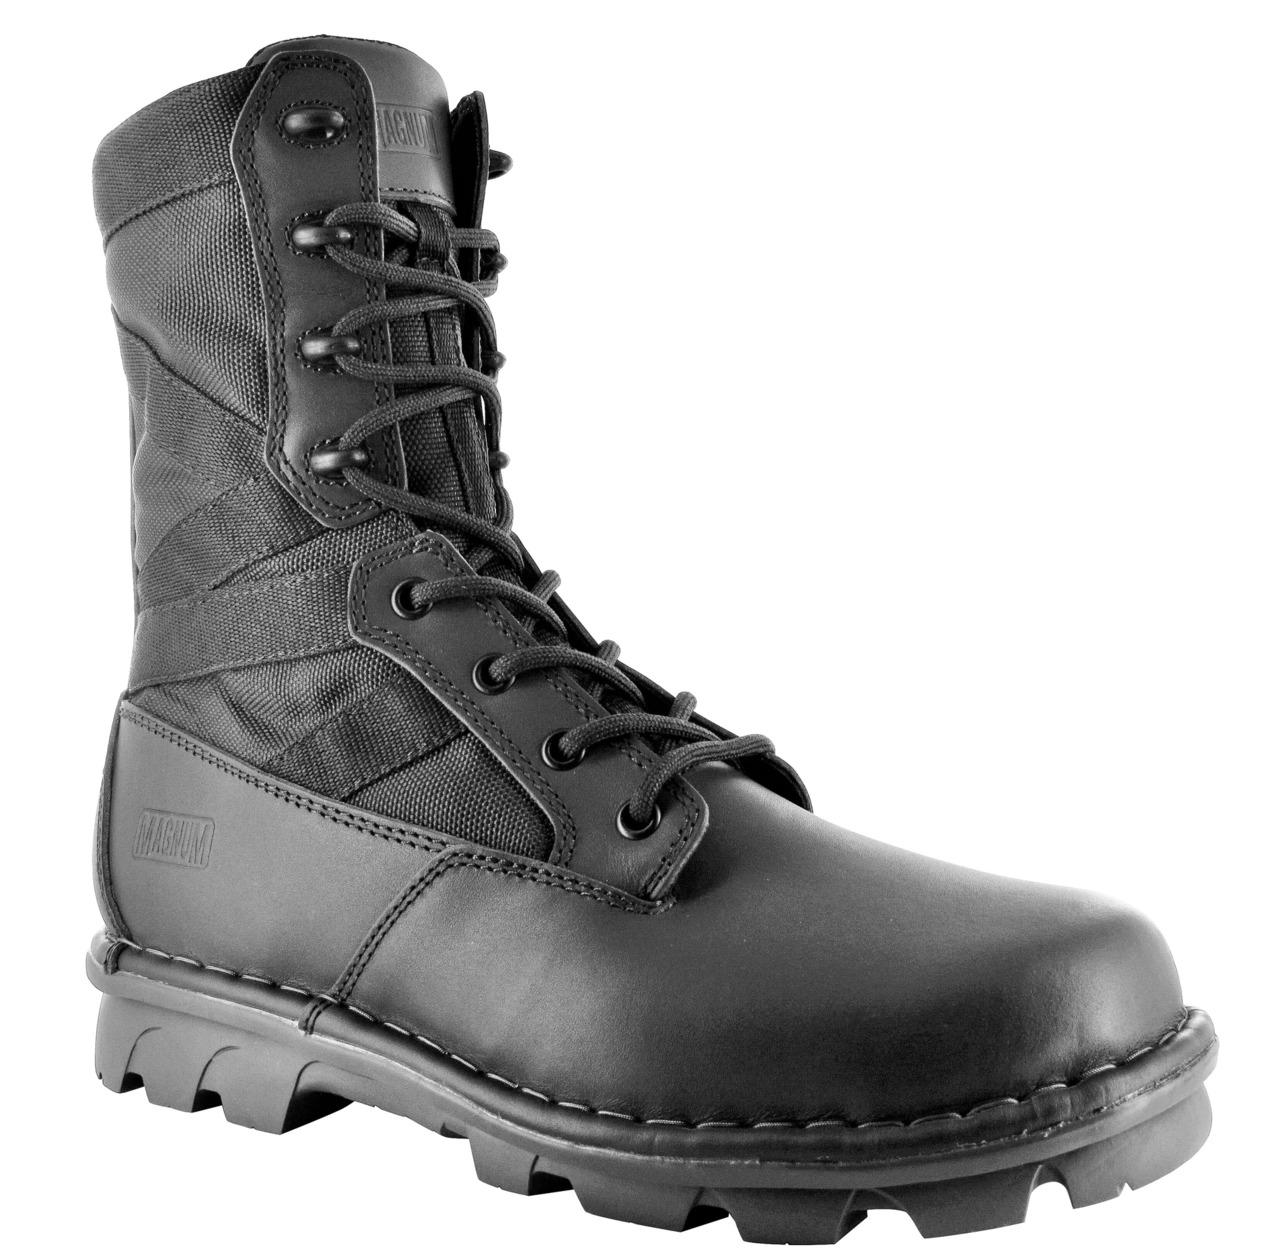 MAGNUM USA Spartan ATB Boot in Footwear 08f6aa647